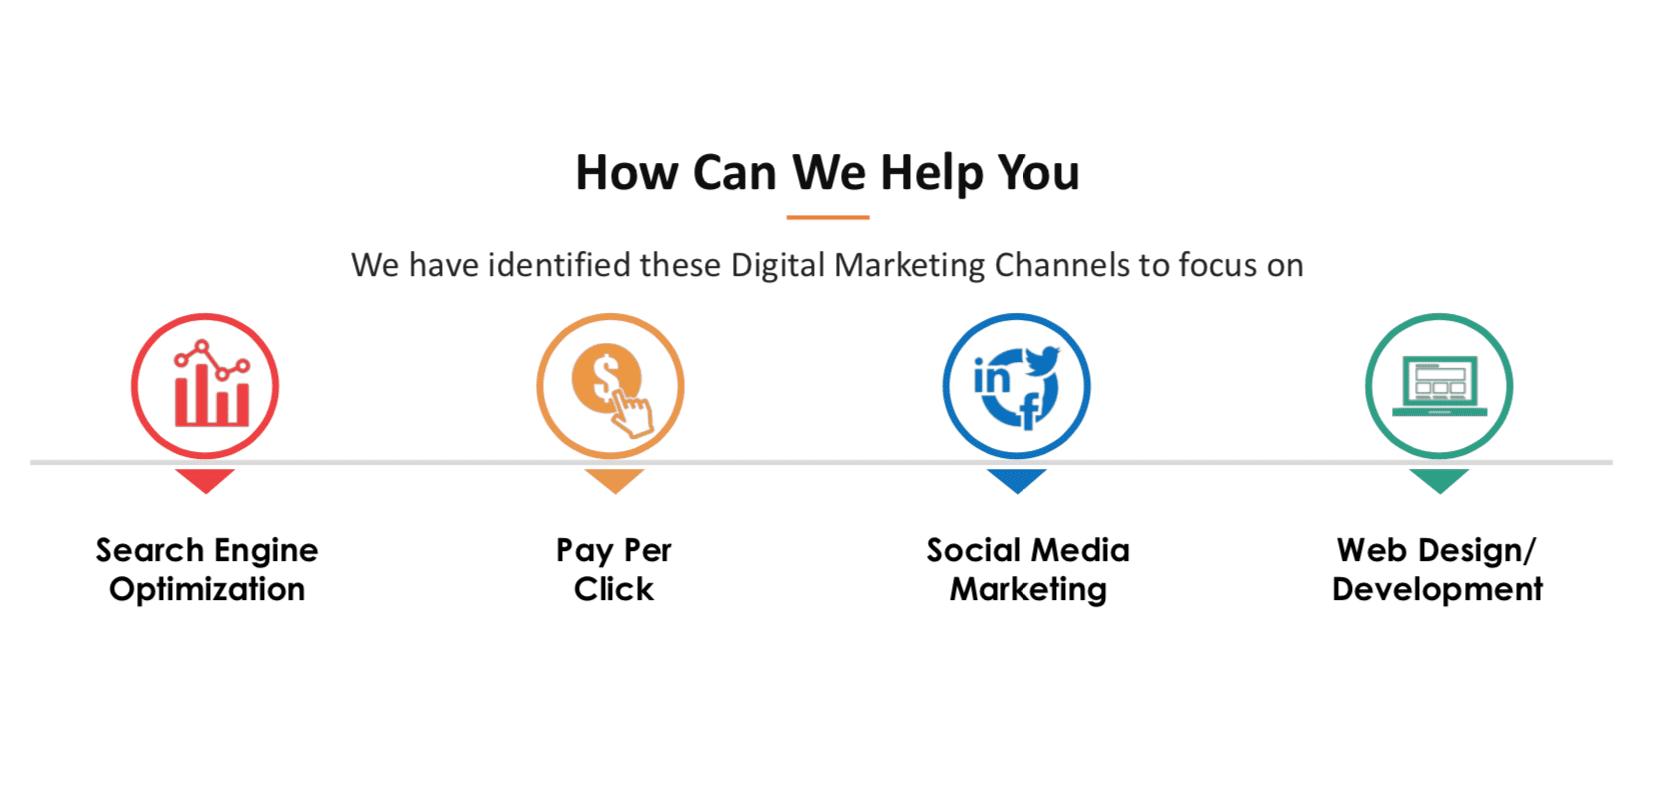 How-Can-We-Help-SEO-PPC-Social-Media-Web-Design